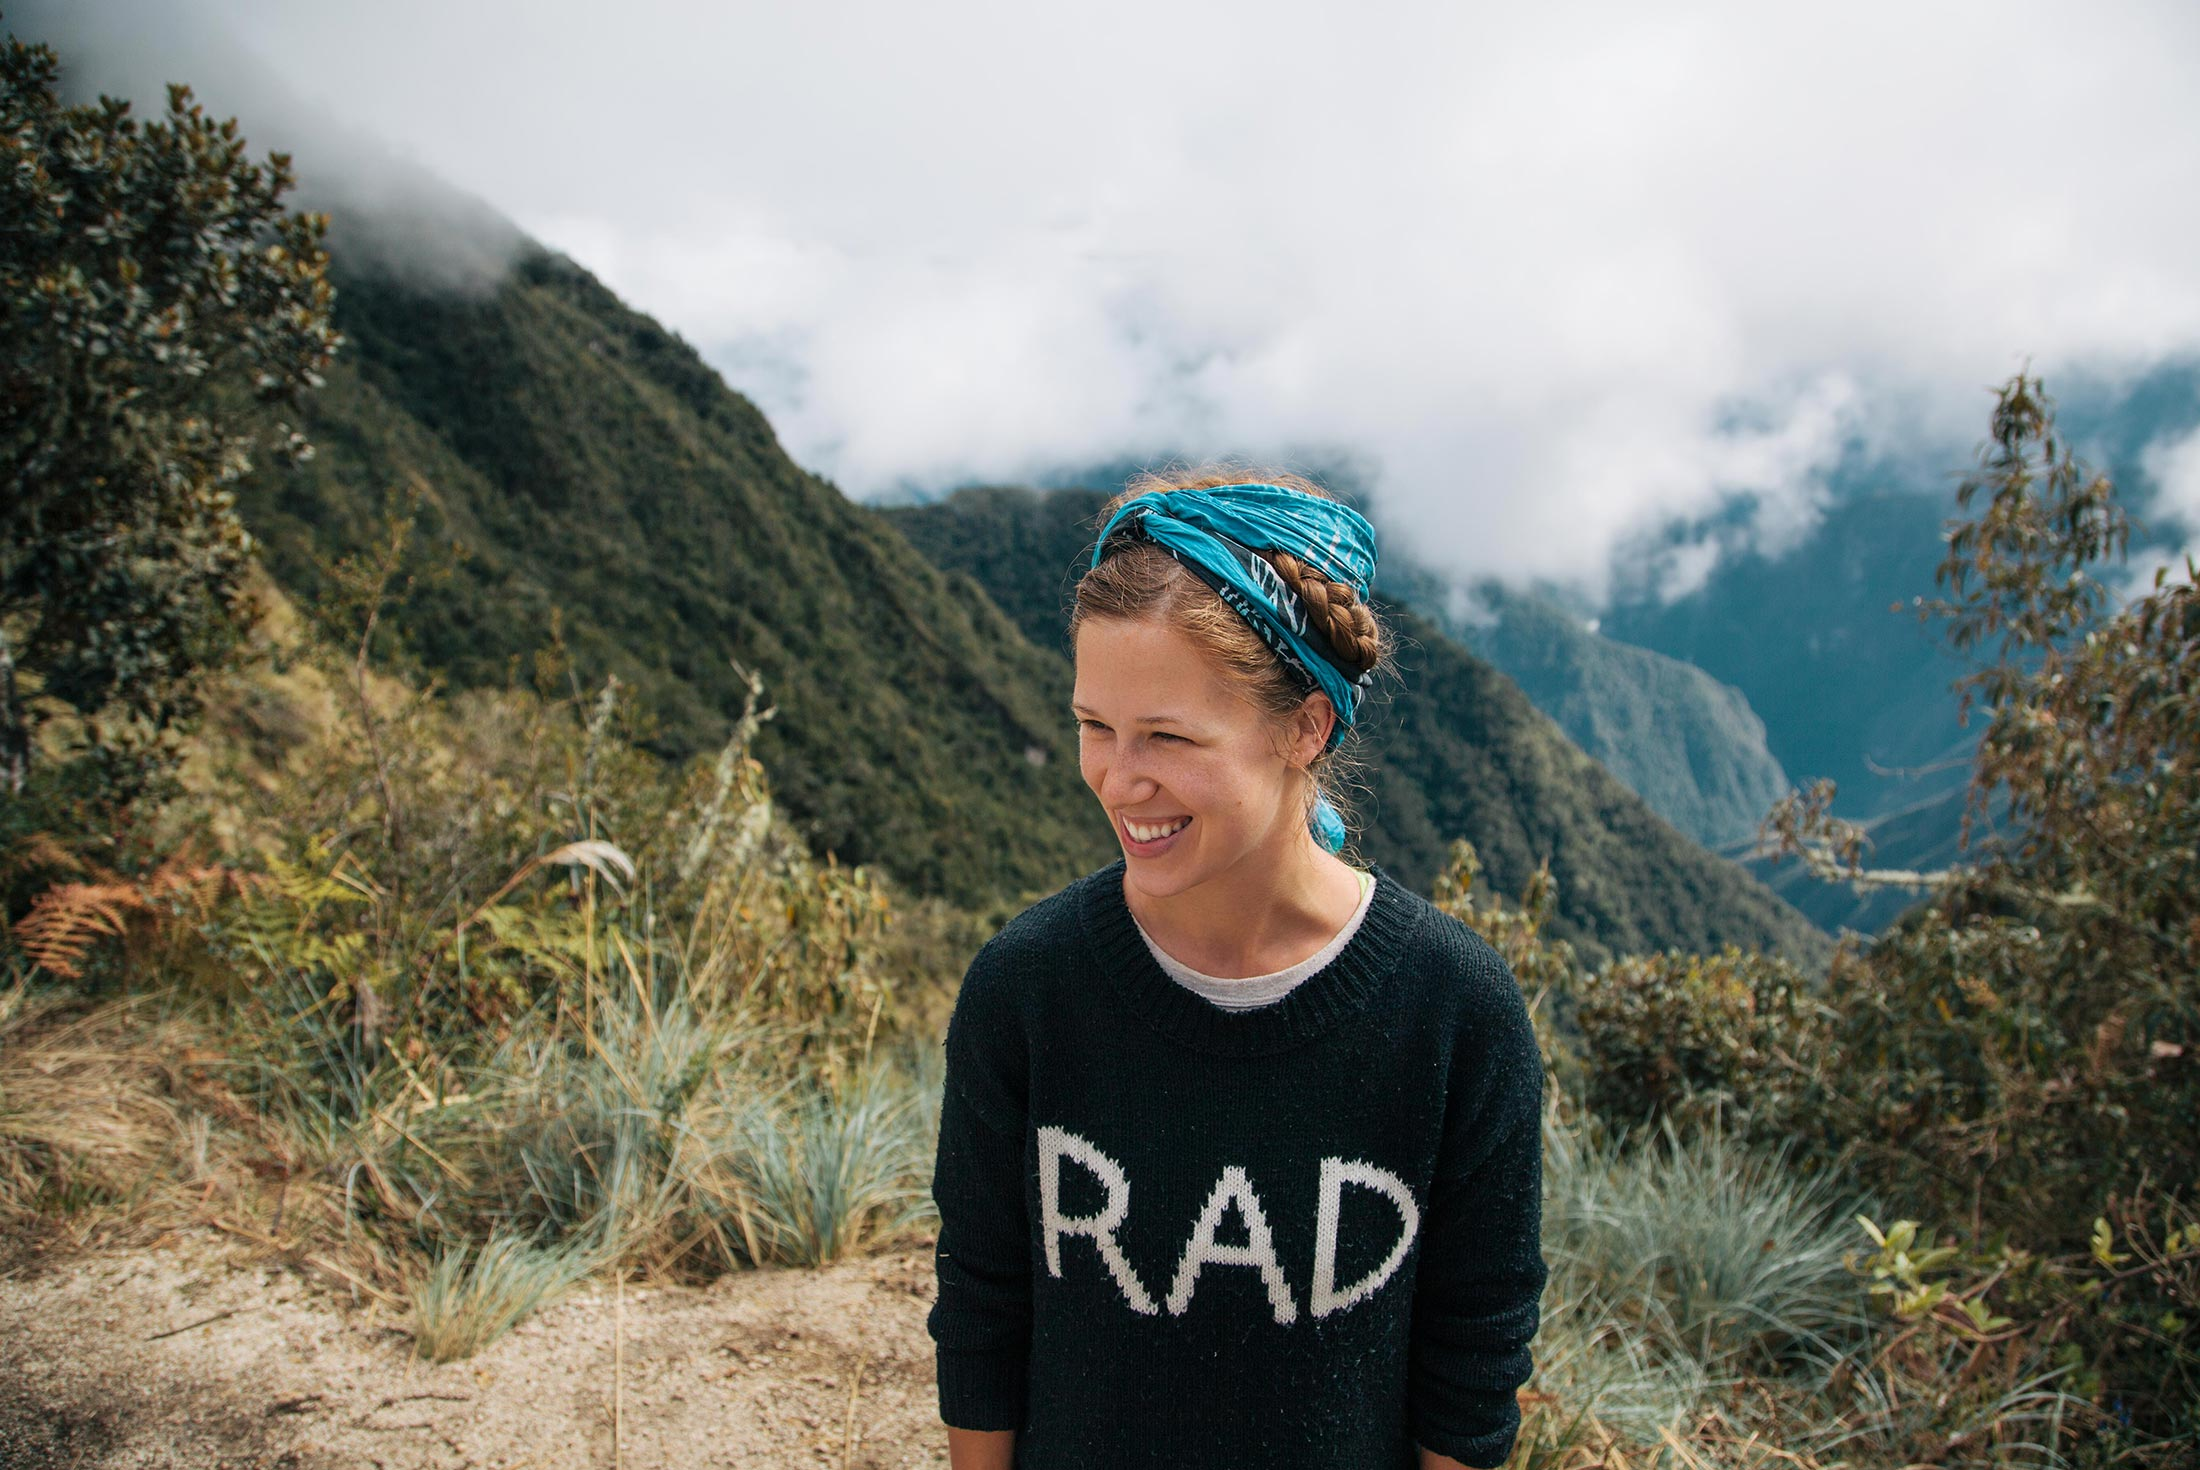 One Week in Peru 2